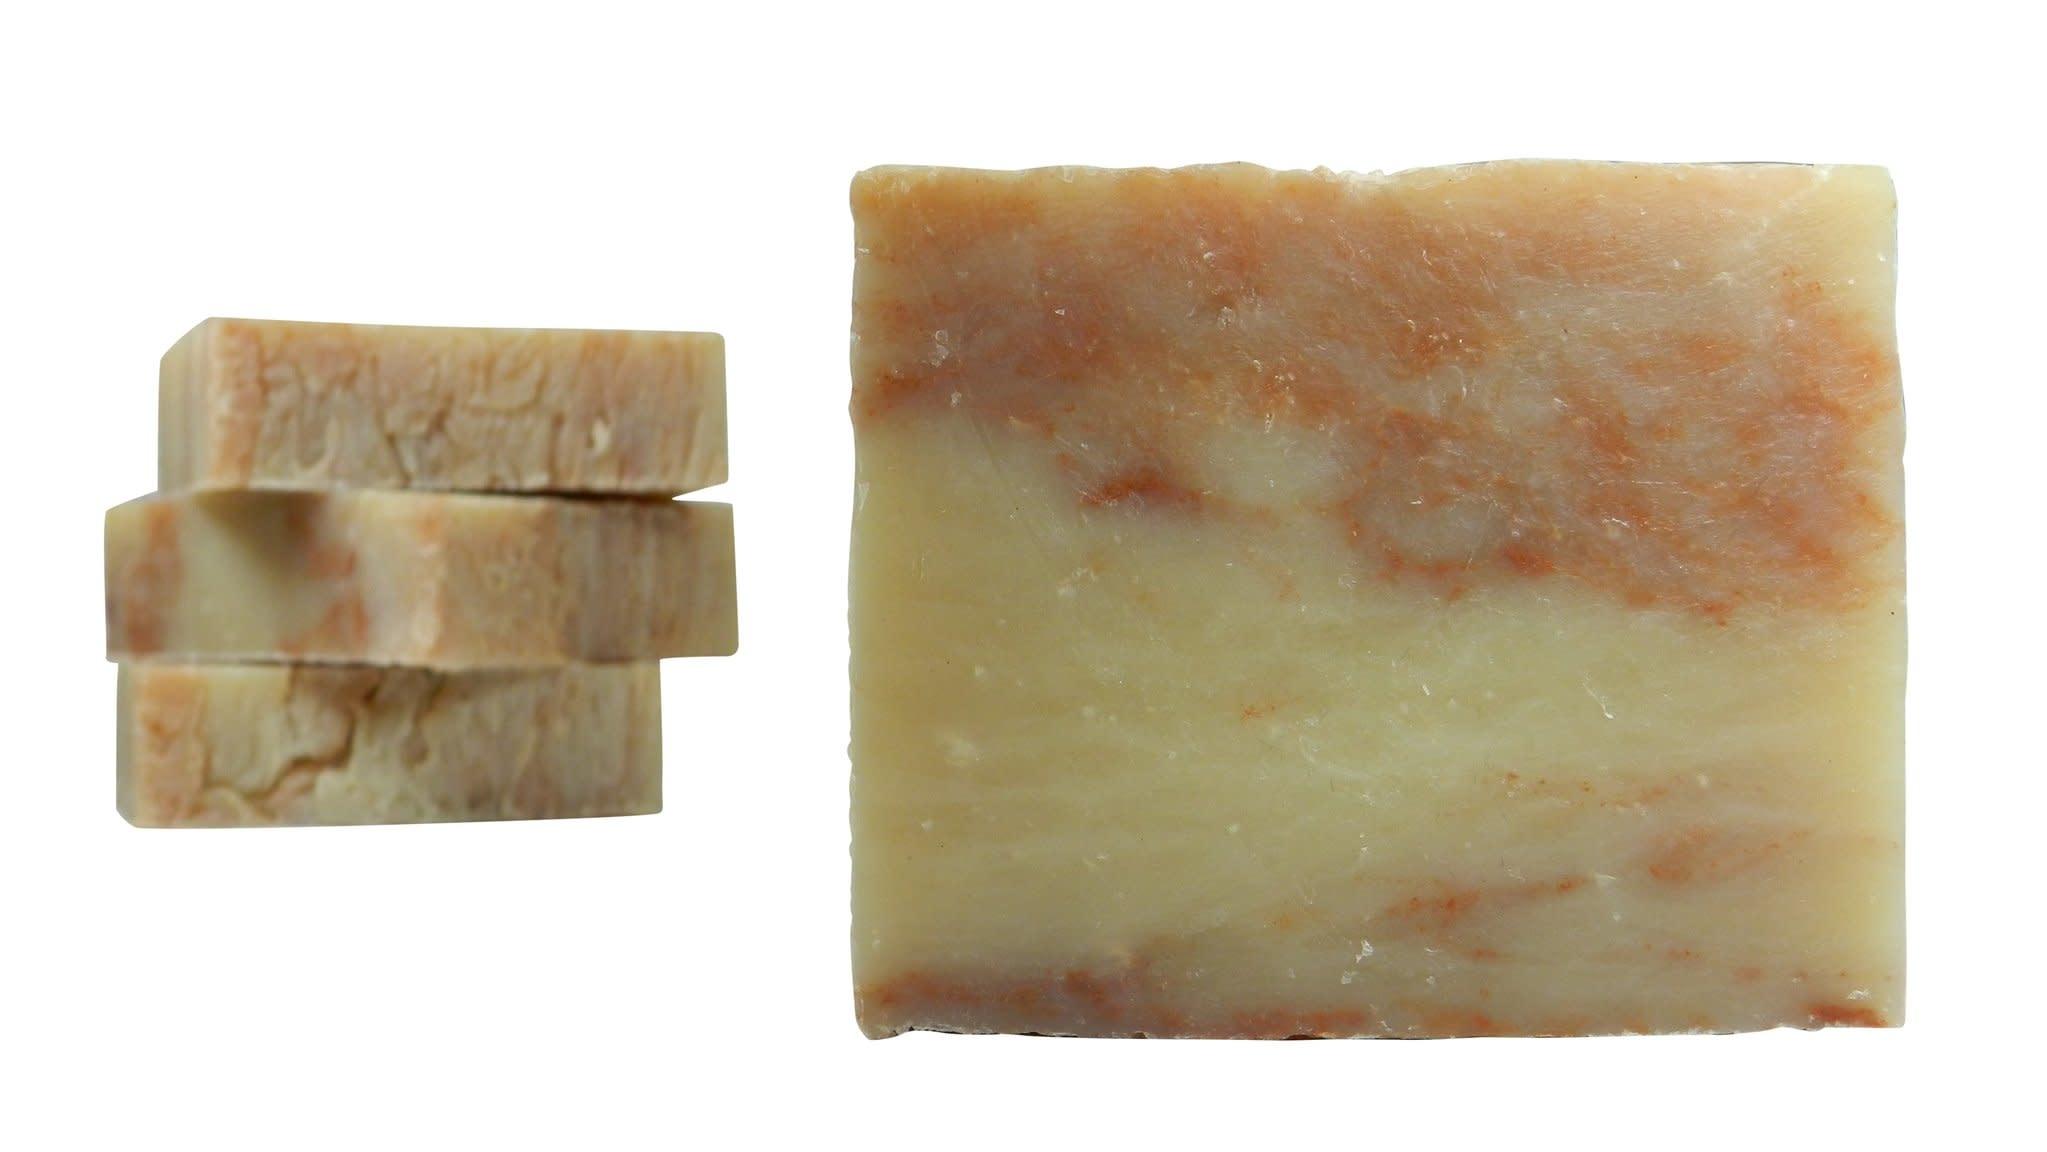 Shameless Soap Co Cherry Almond Soap